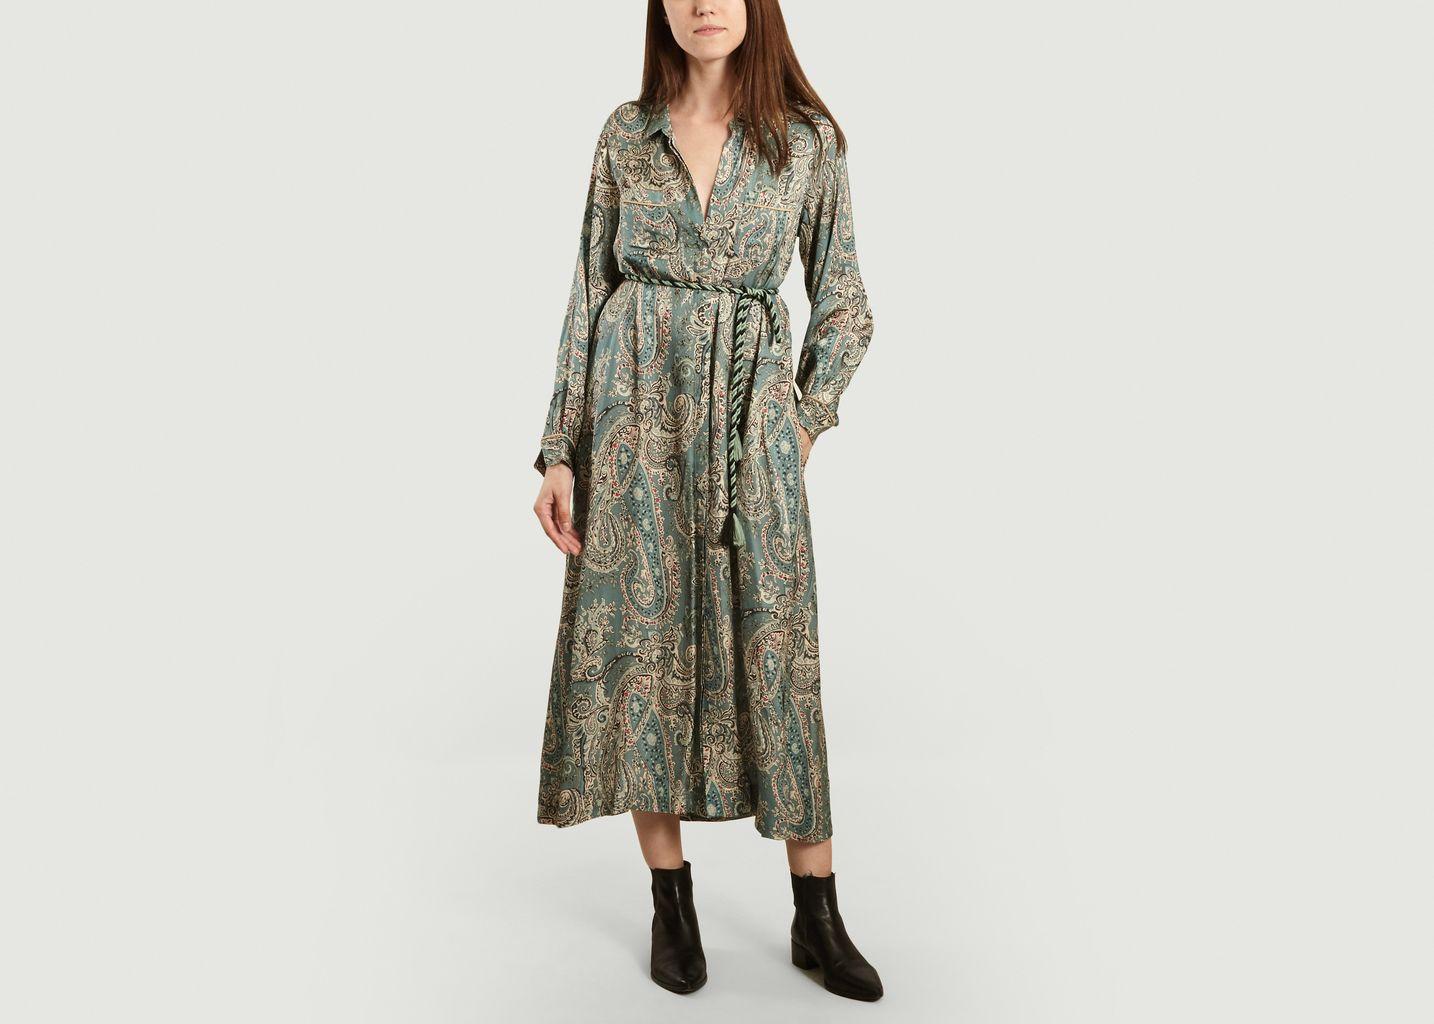 Robe-chemise longue imprimé cachemire Chine - Swildens